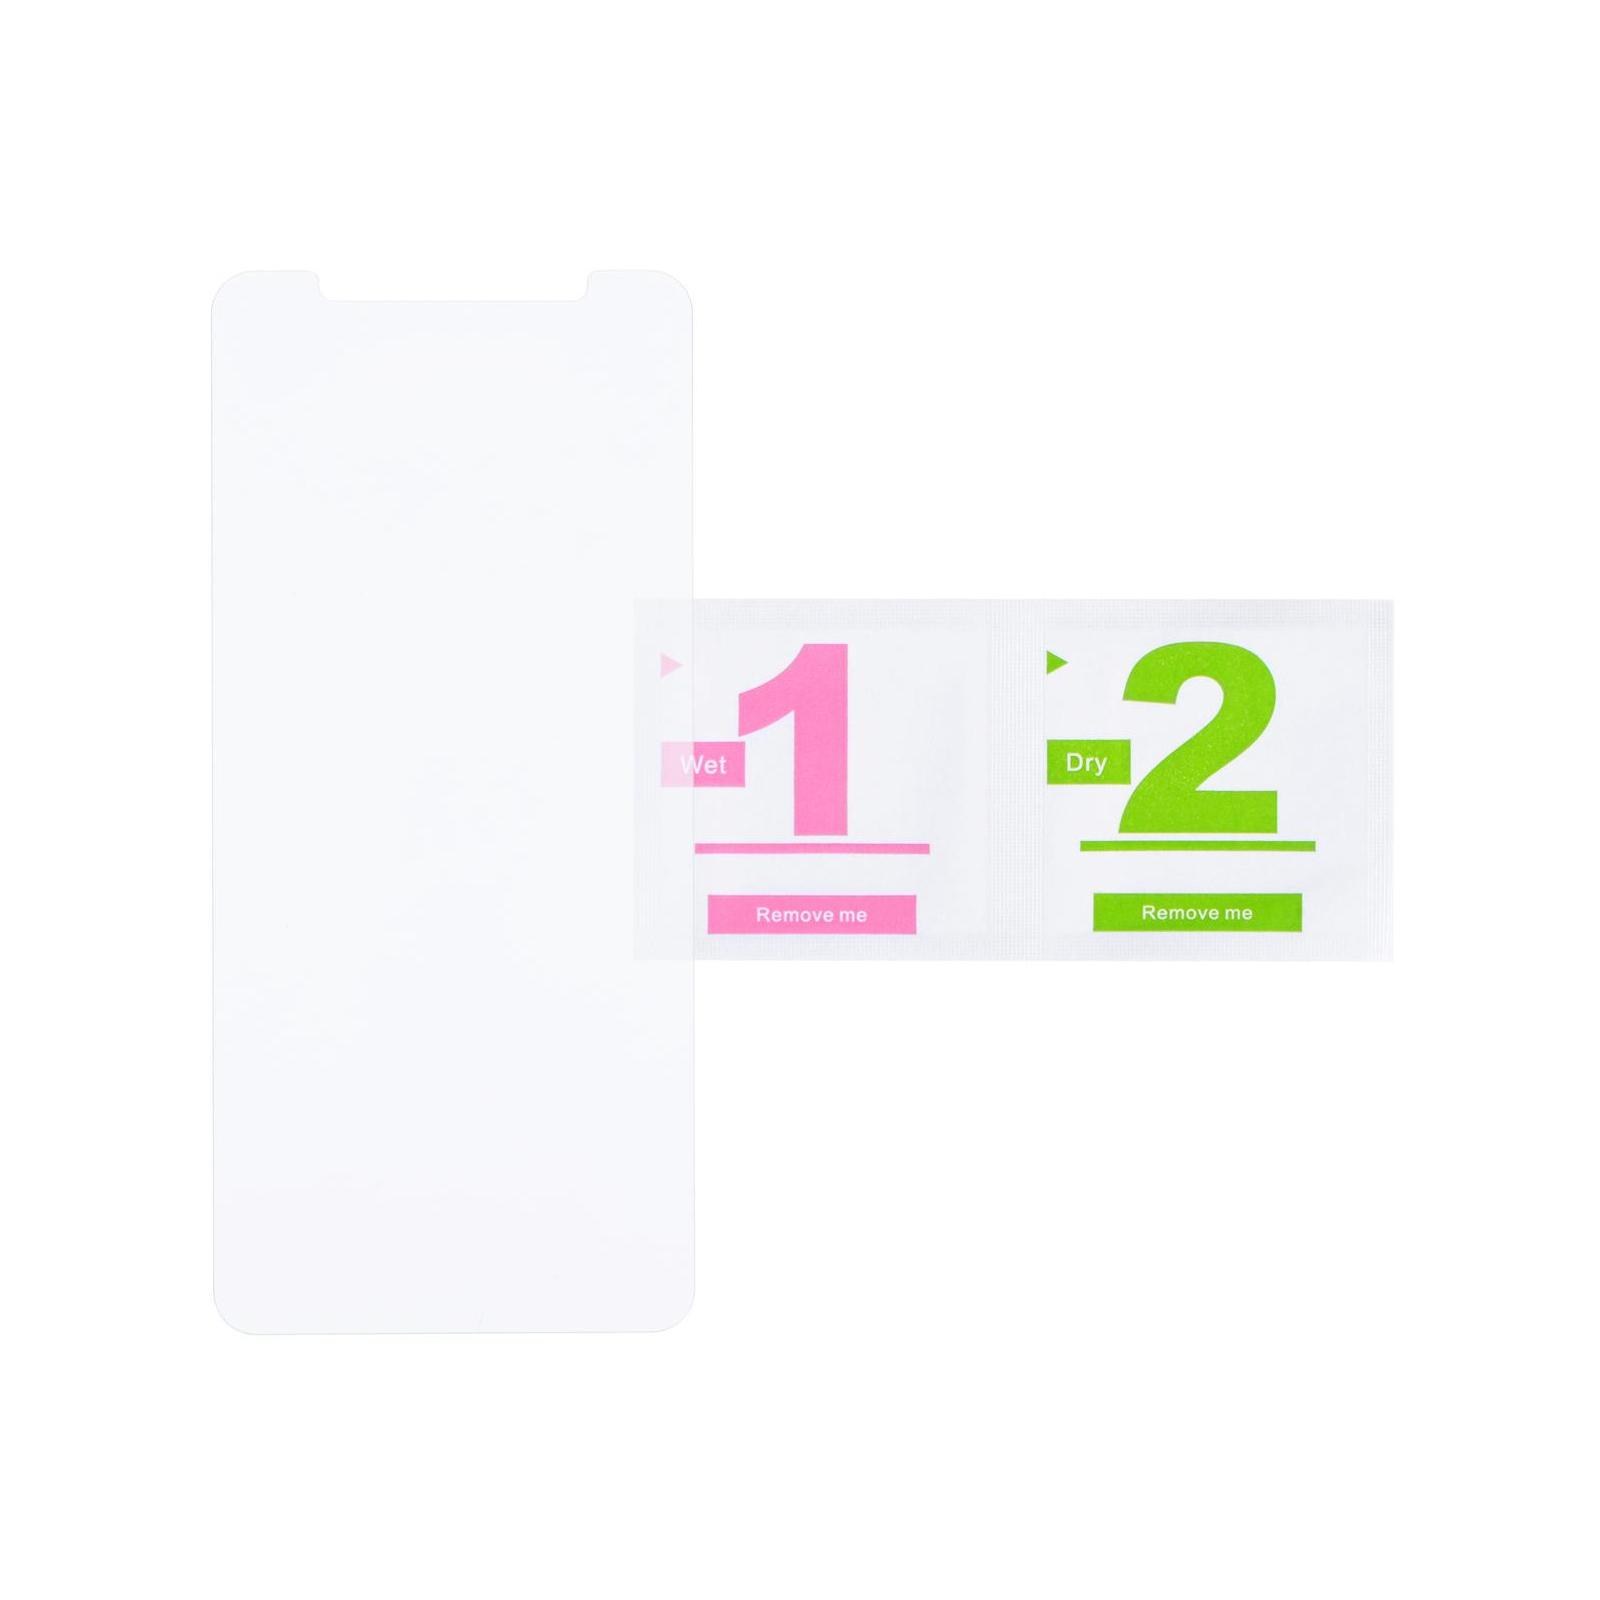 Стекло защитное 2E для Huawei Y5 2018 2.5D Clear (2E-TGHW-Y518-25D) изображение 2